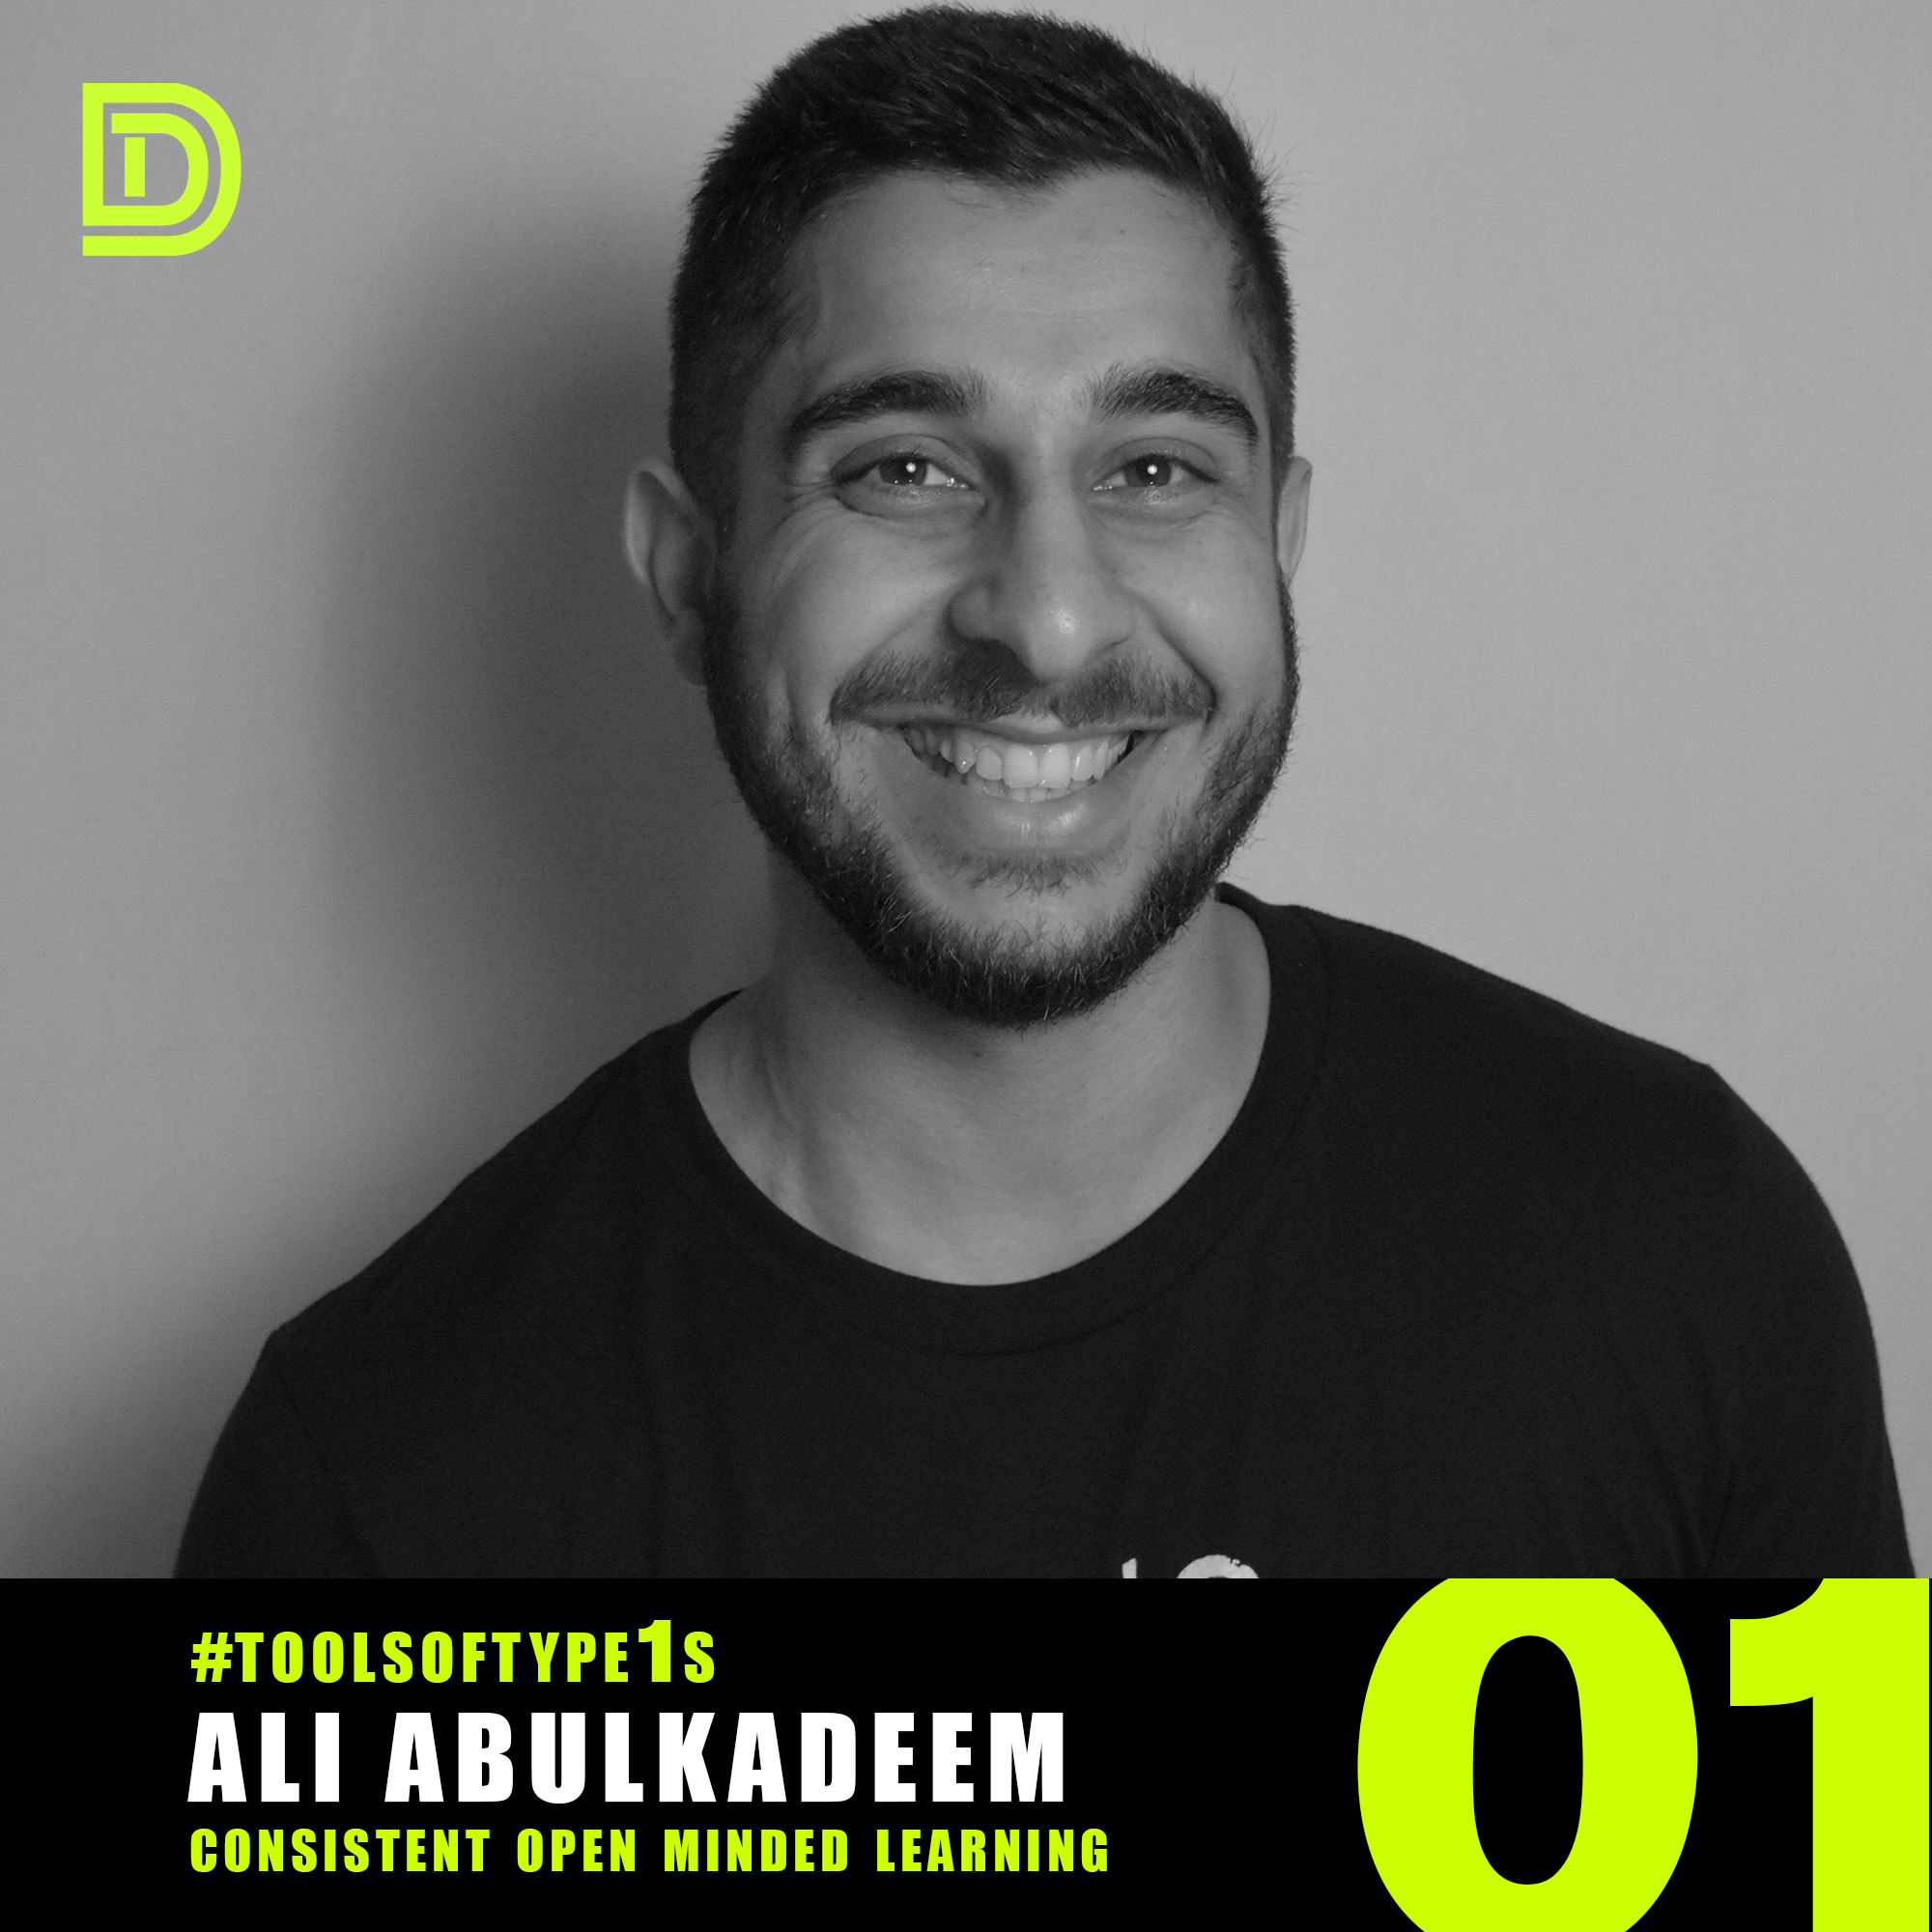 Tools-of-type-1s-ali-abdulkareem